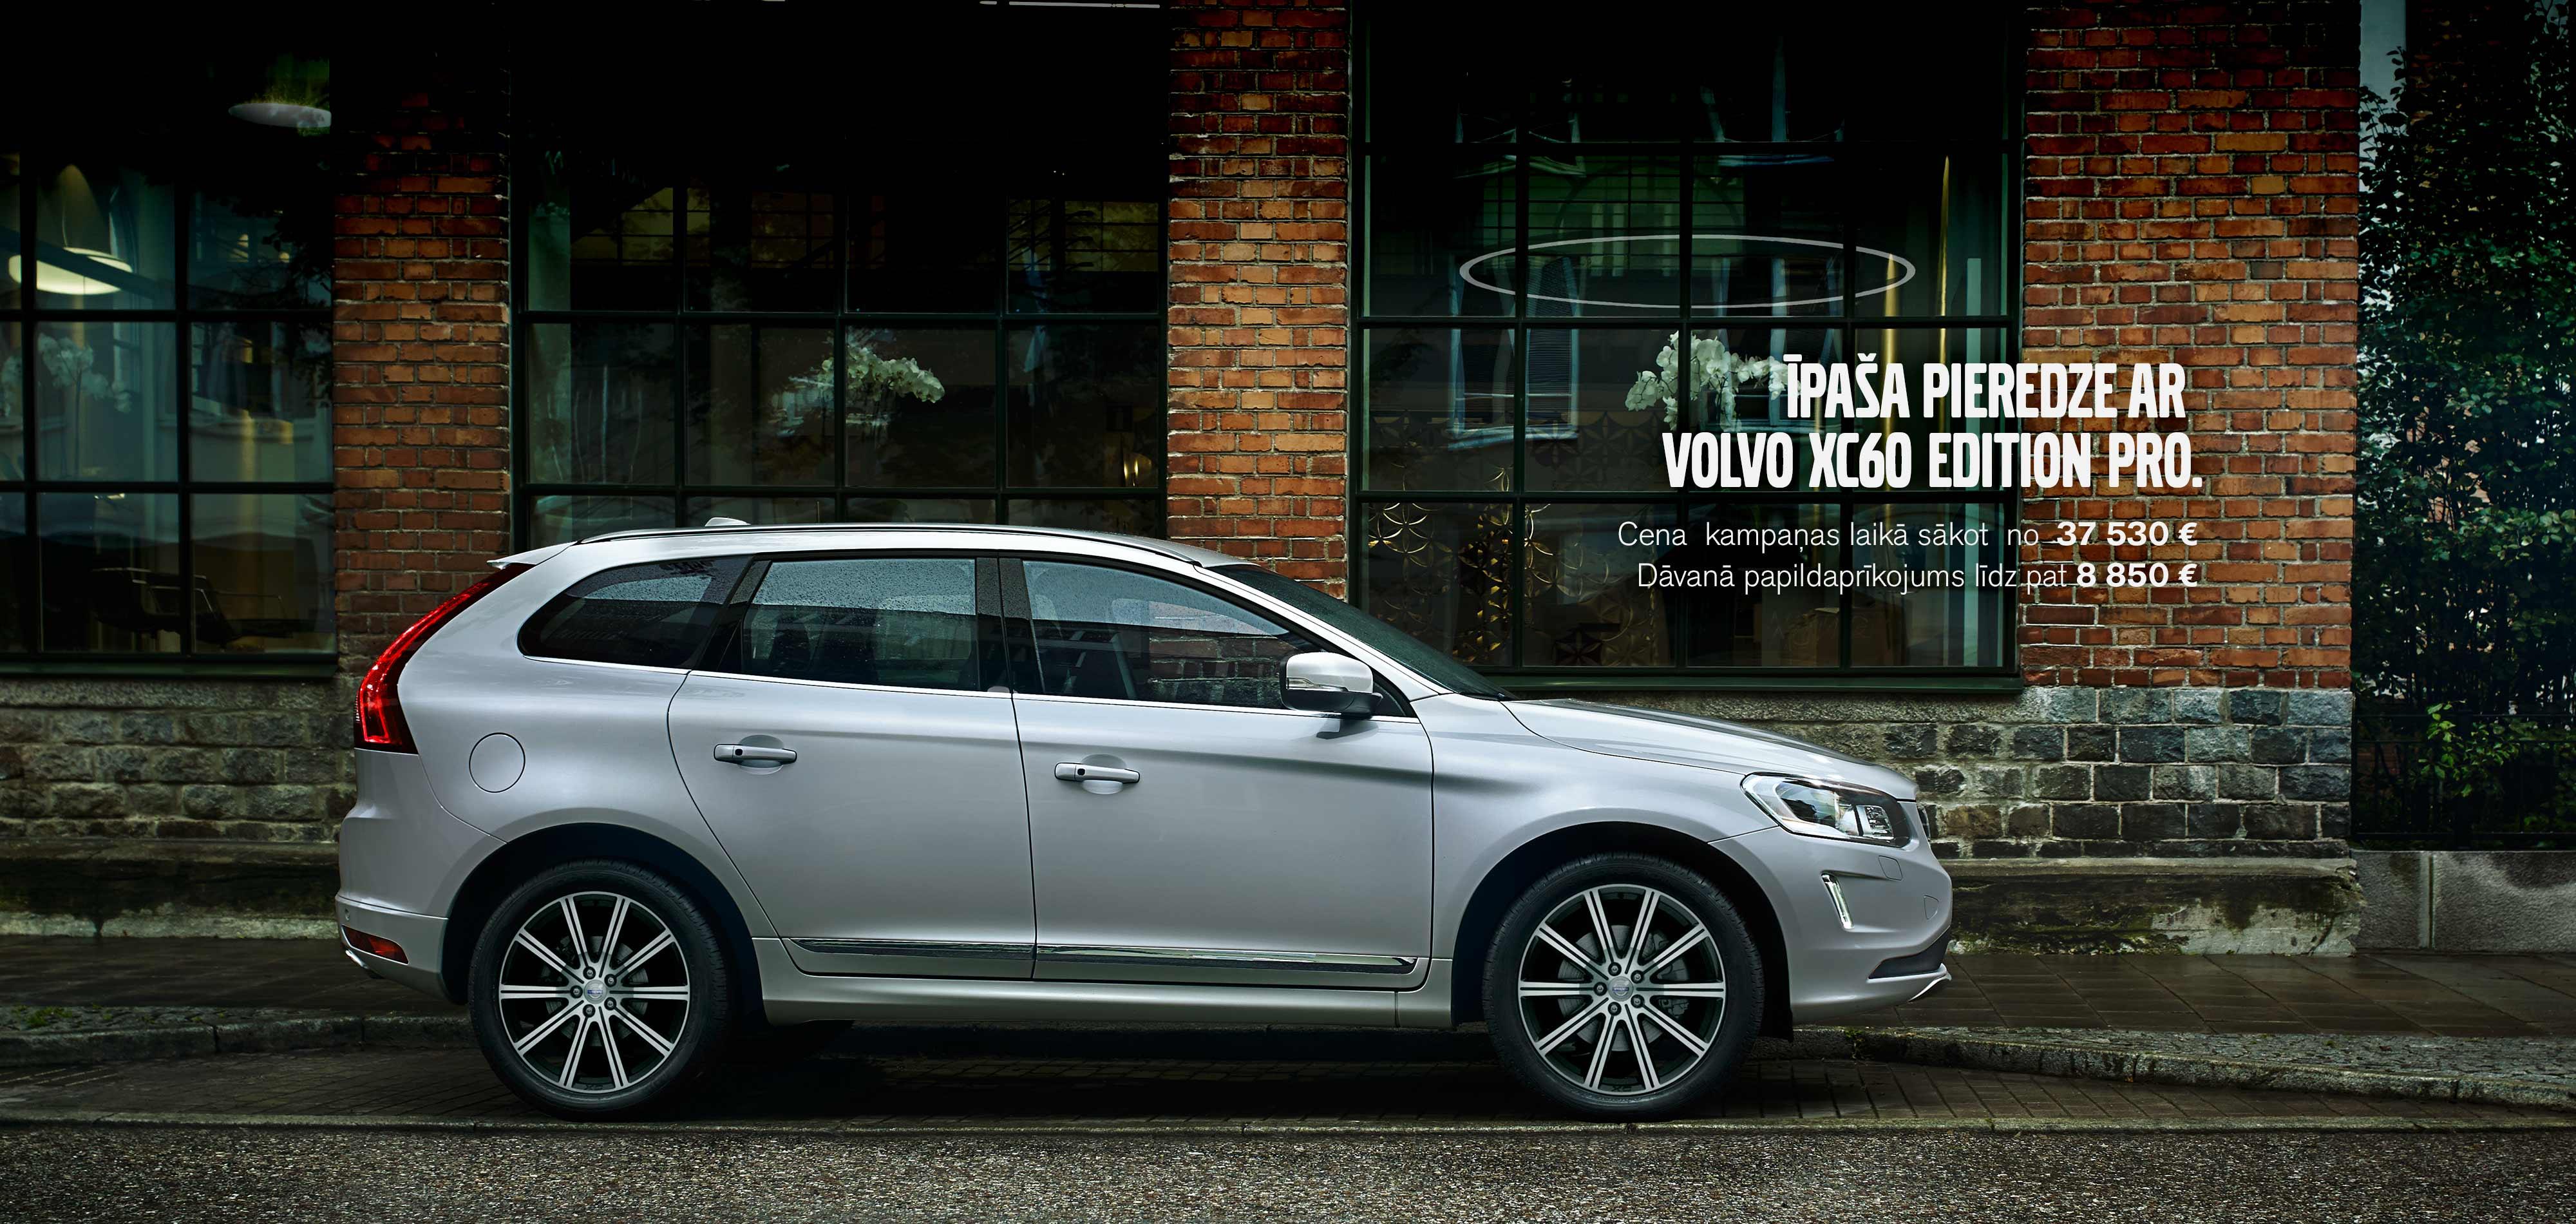 Volvo XC60 Edition Pro